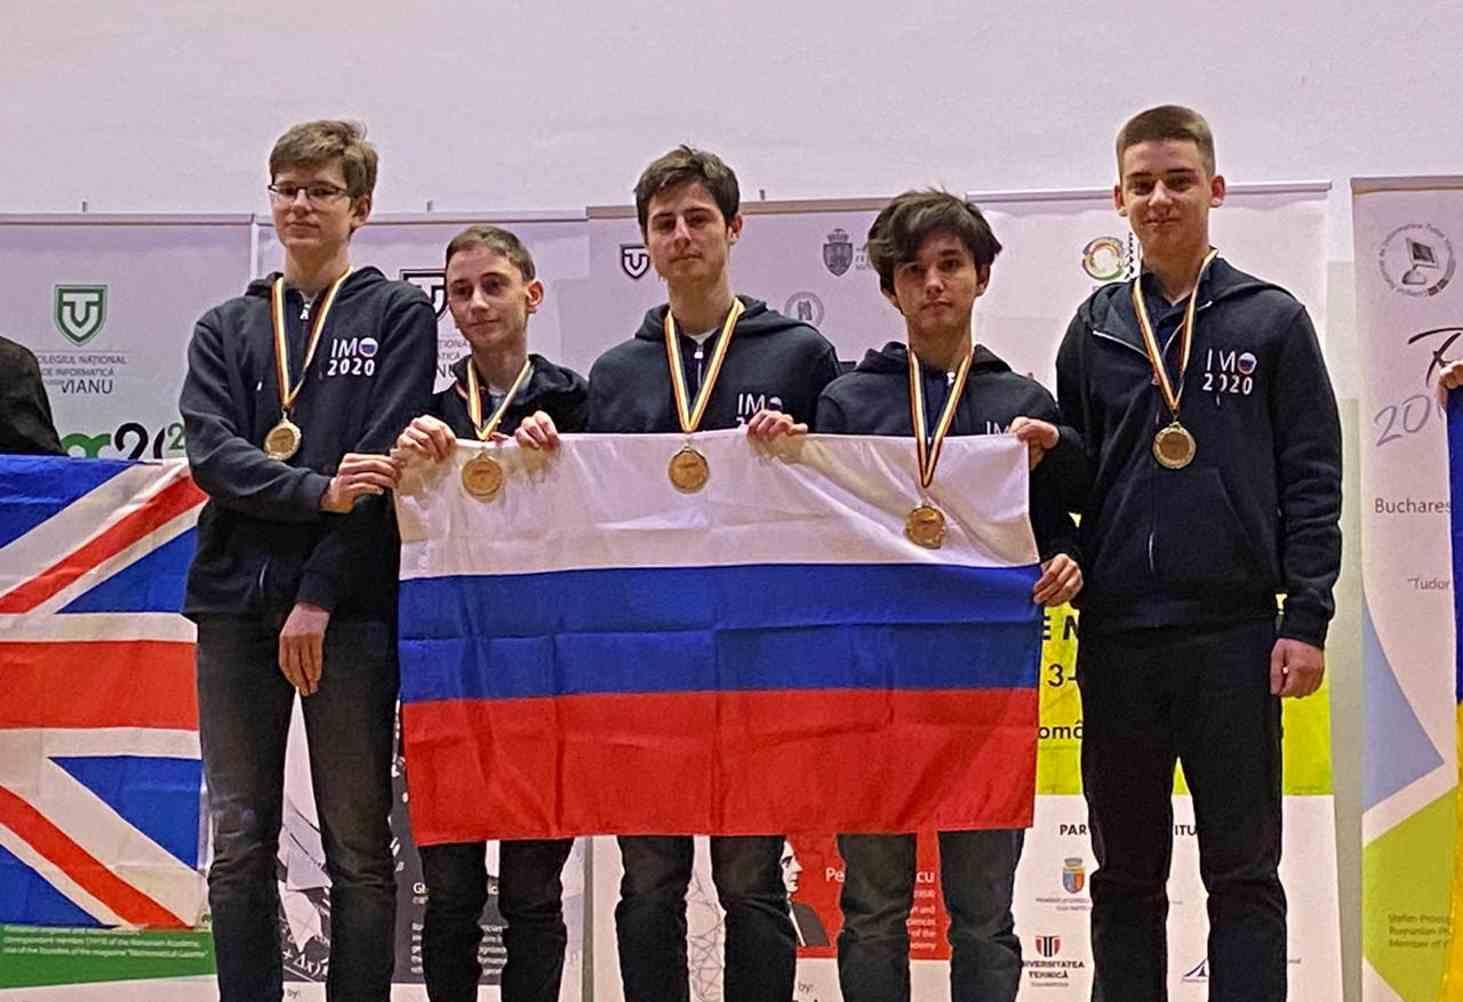 rossijskie-shkolniki-zavoevali-pyat-zolotyh-medalej-na-mezhdunarodnoj-olimpiade-po-matematike